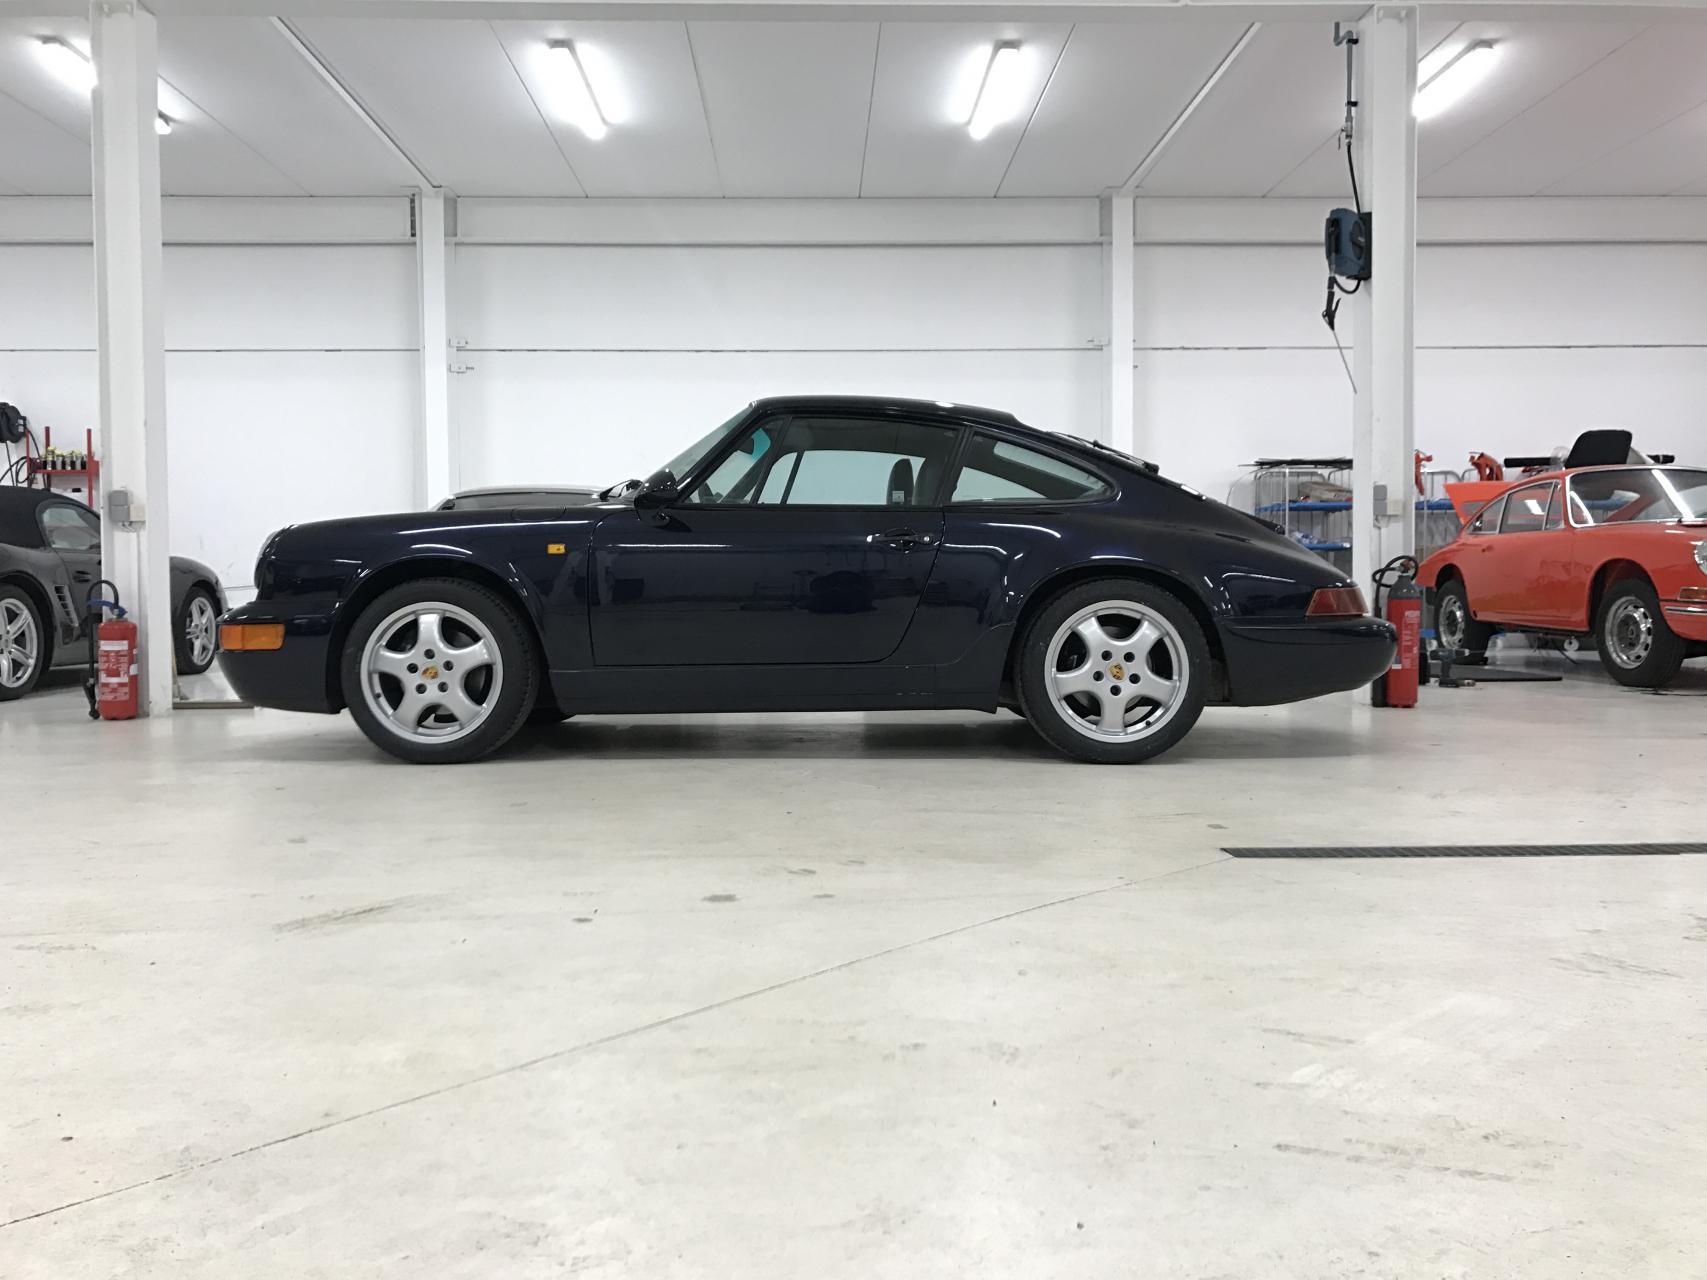 Porsche 964 Carrera 2 - Midnight Blue - 1991 - 1 of 1